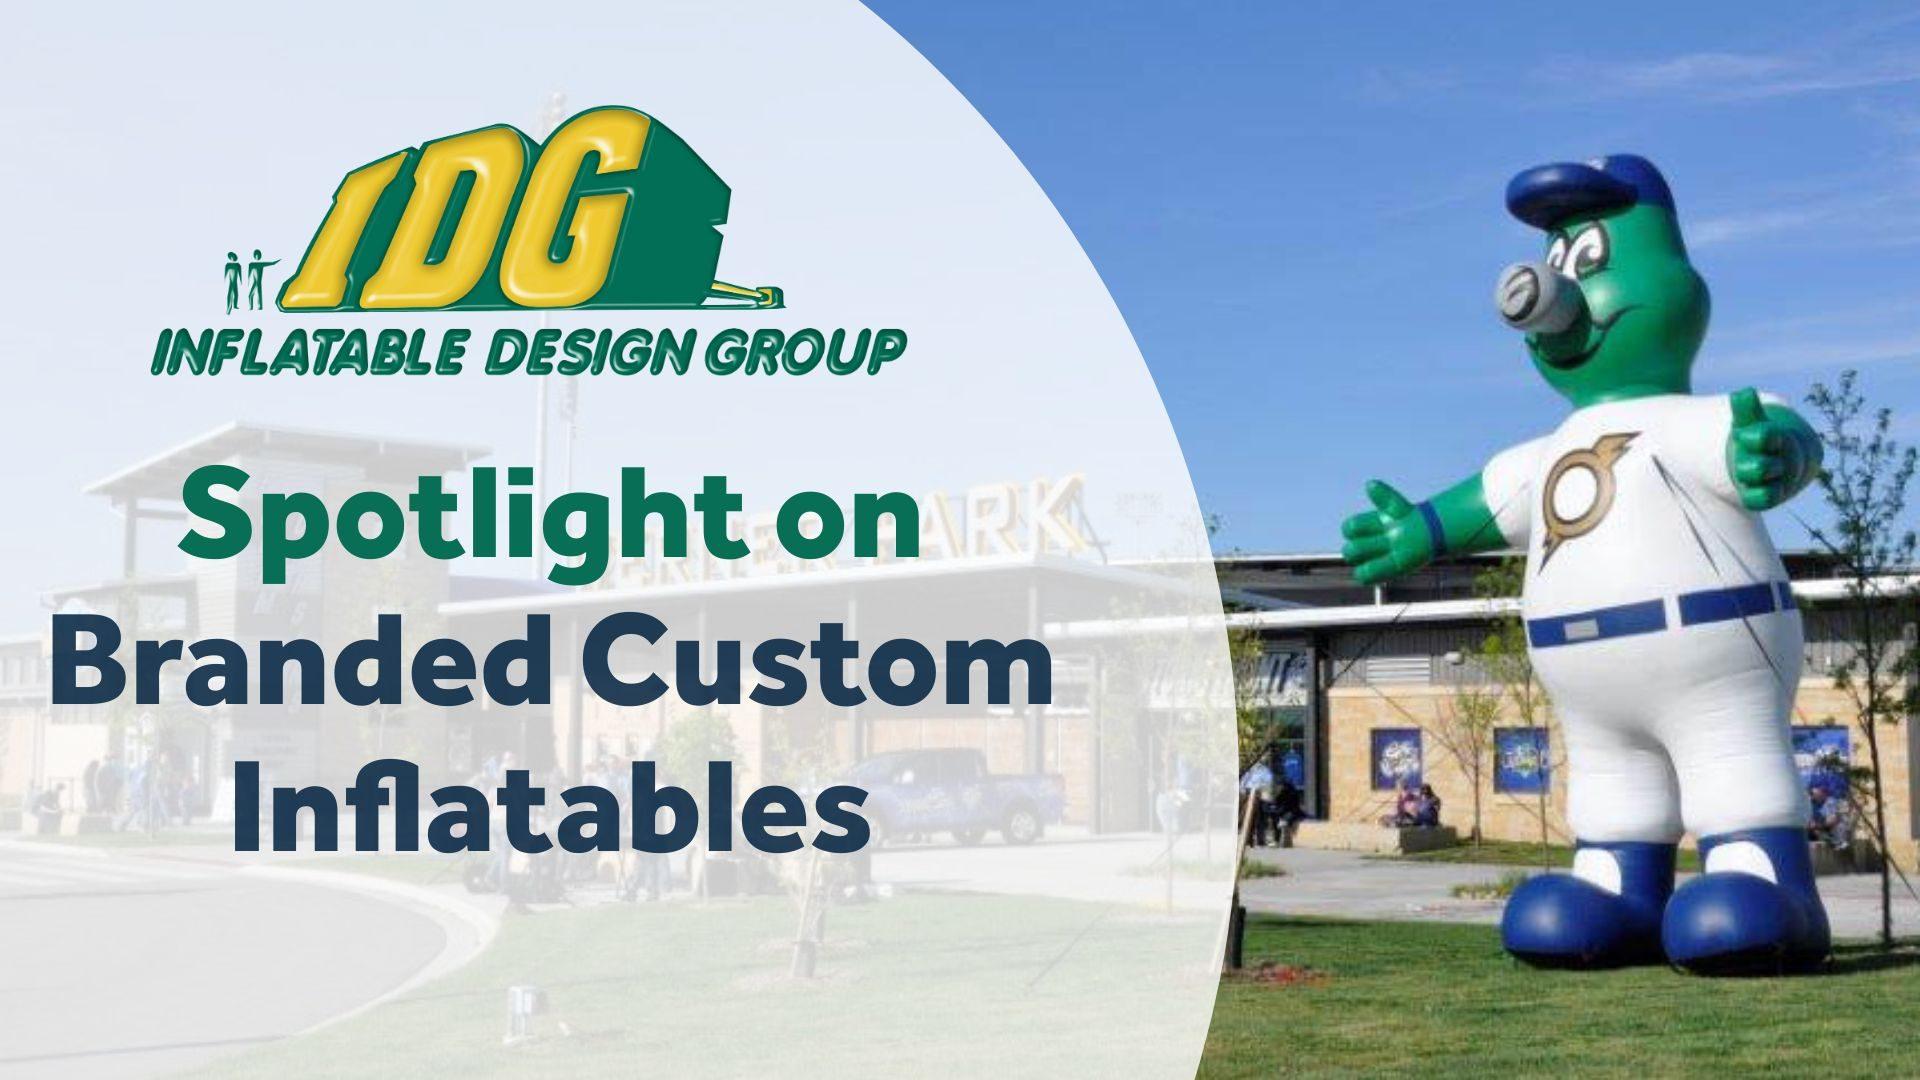 Spotlight on Branded Custom Inflatables